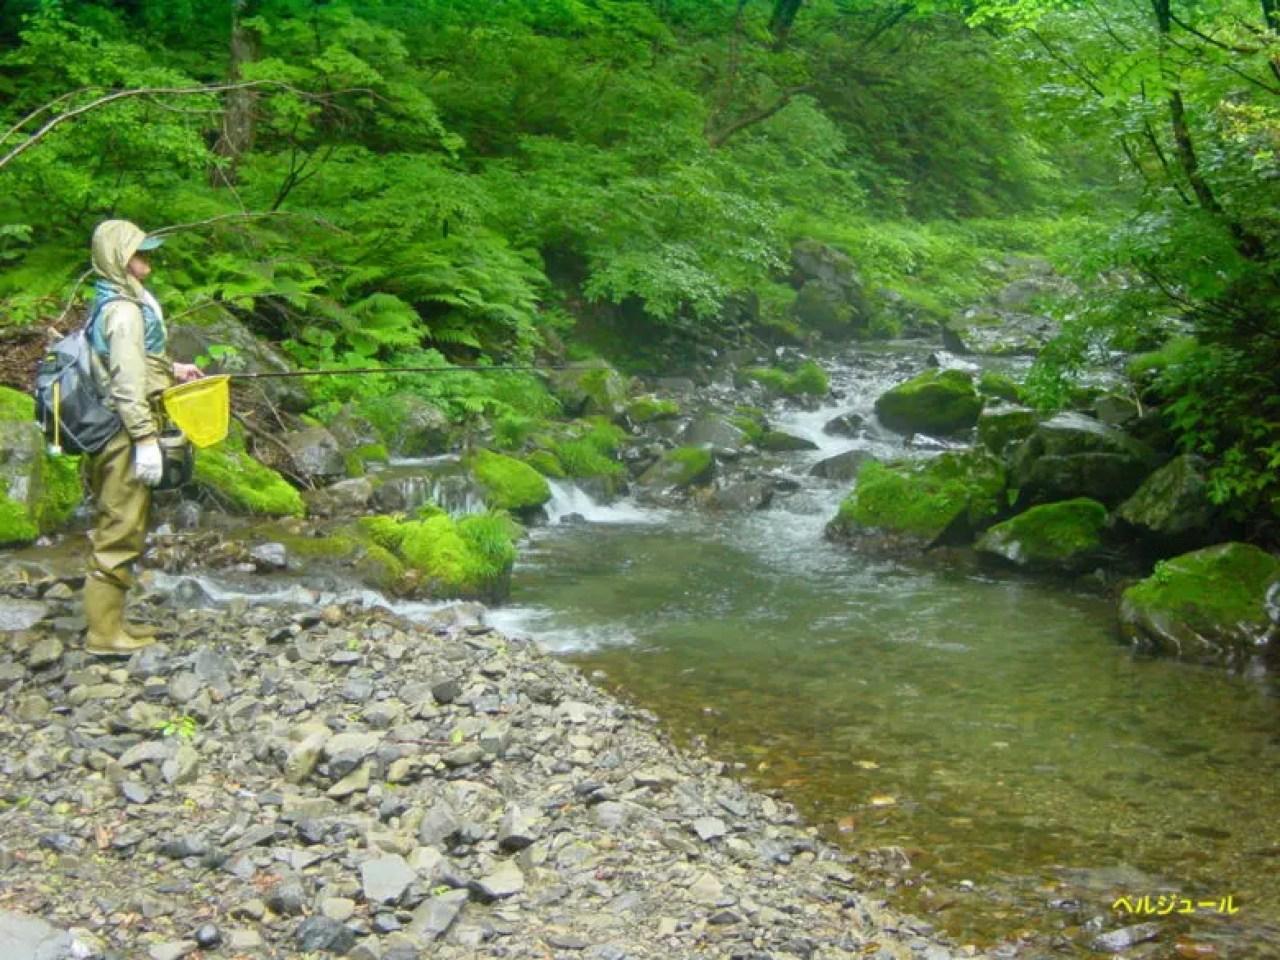 tokuyama00016 - 揖斐川上流・旧徳山村での岩魚釣り